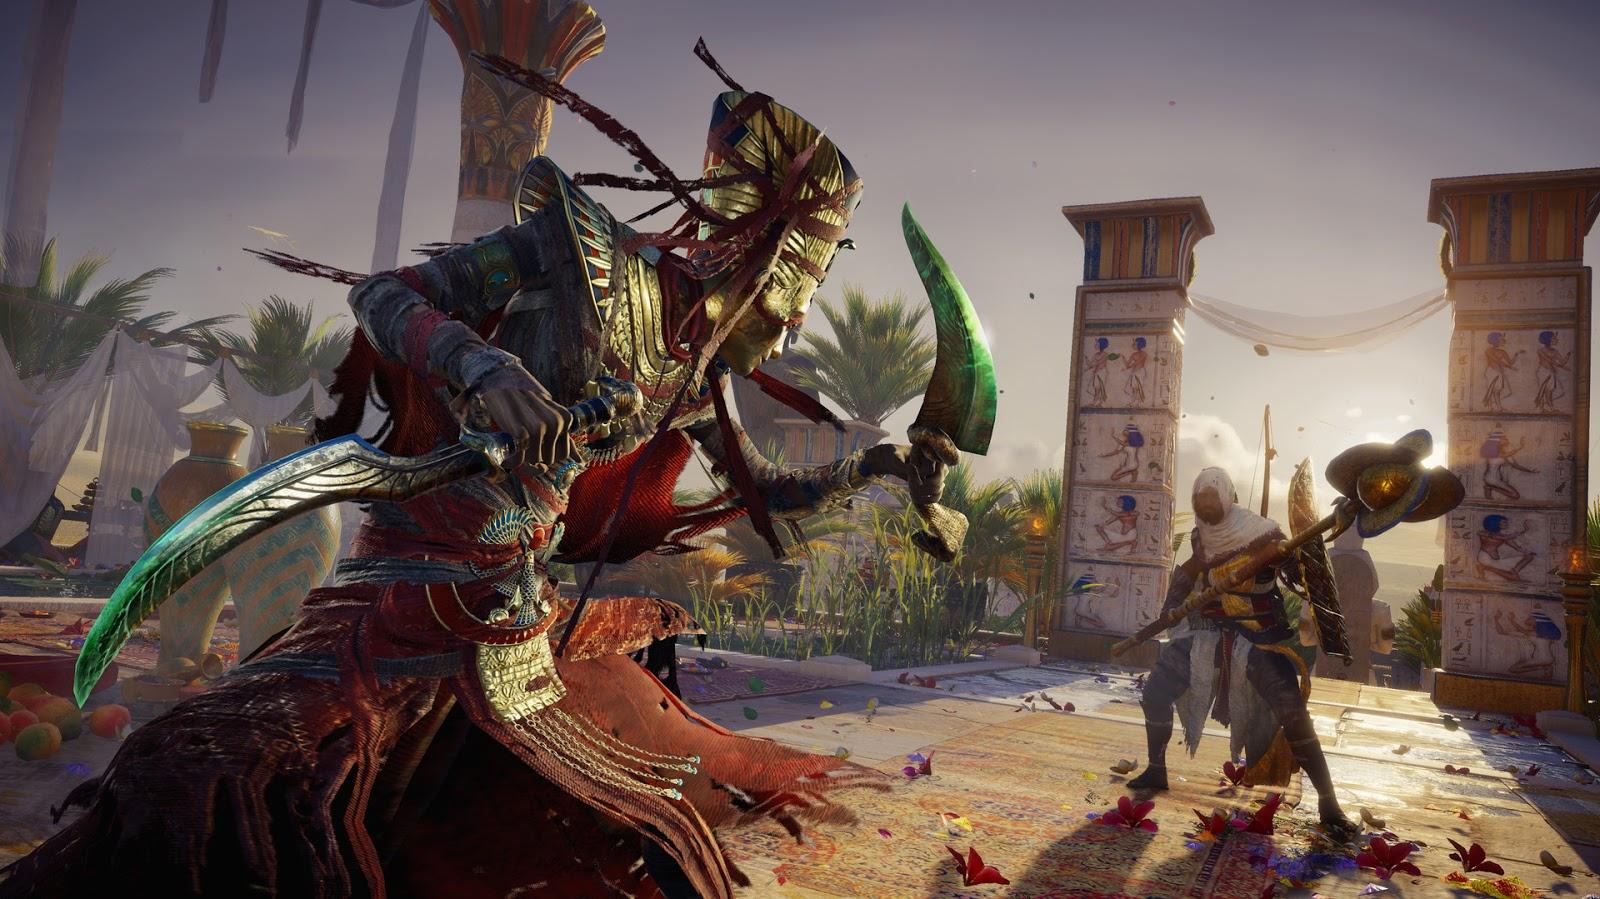 Assassin's Creed Origins The Curse Of The Pharaohs PC ESPAÑOL + Crackfix (CODEX) + REPACK 11 DVD5 (JPW) 2